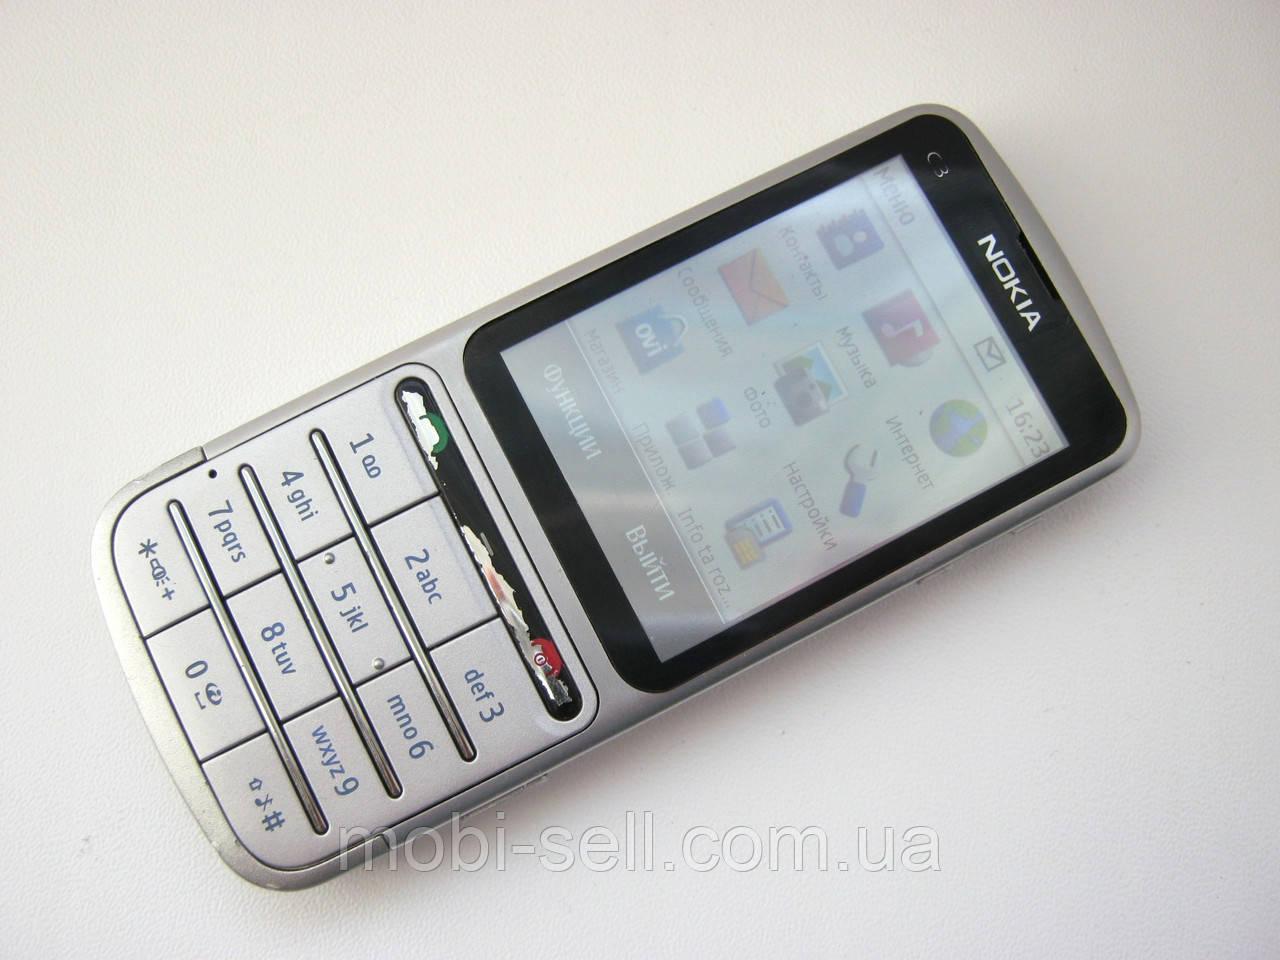 877245221e1b5 Б/У Мобильный телефон Nokia C3-01, 1SIM / 3G / Wi-Fi / BT / 5Мп ...